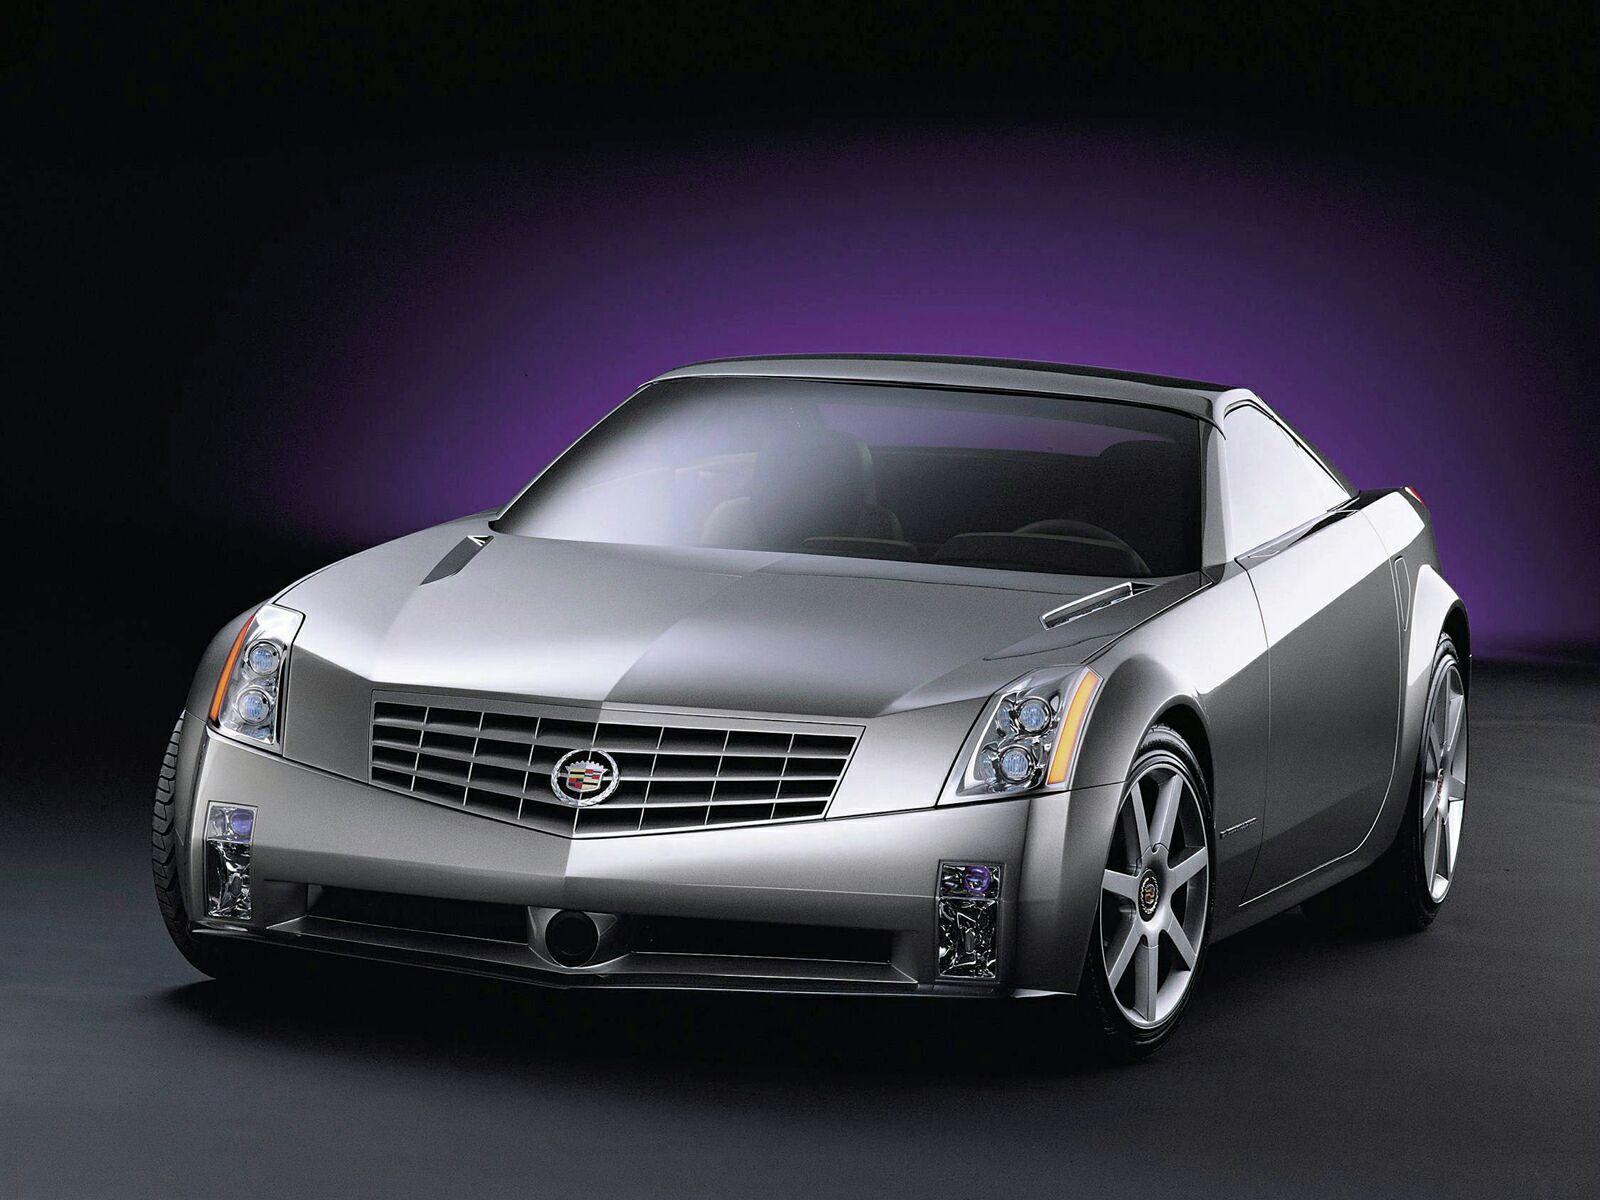 Cadillac Evoq 1999 Old Concept Cars